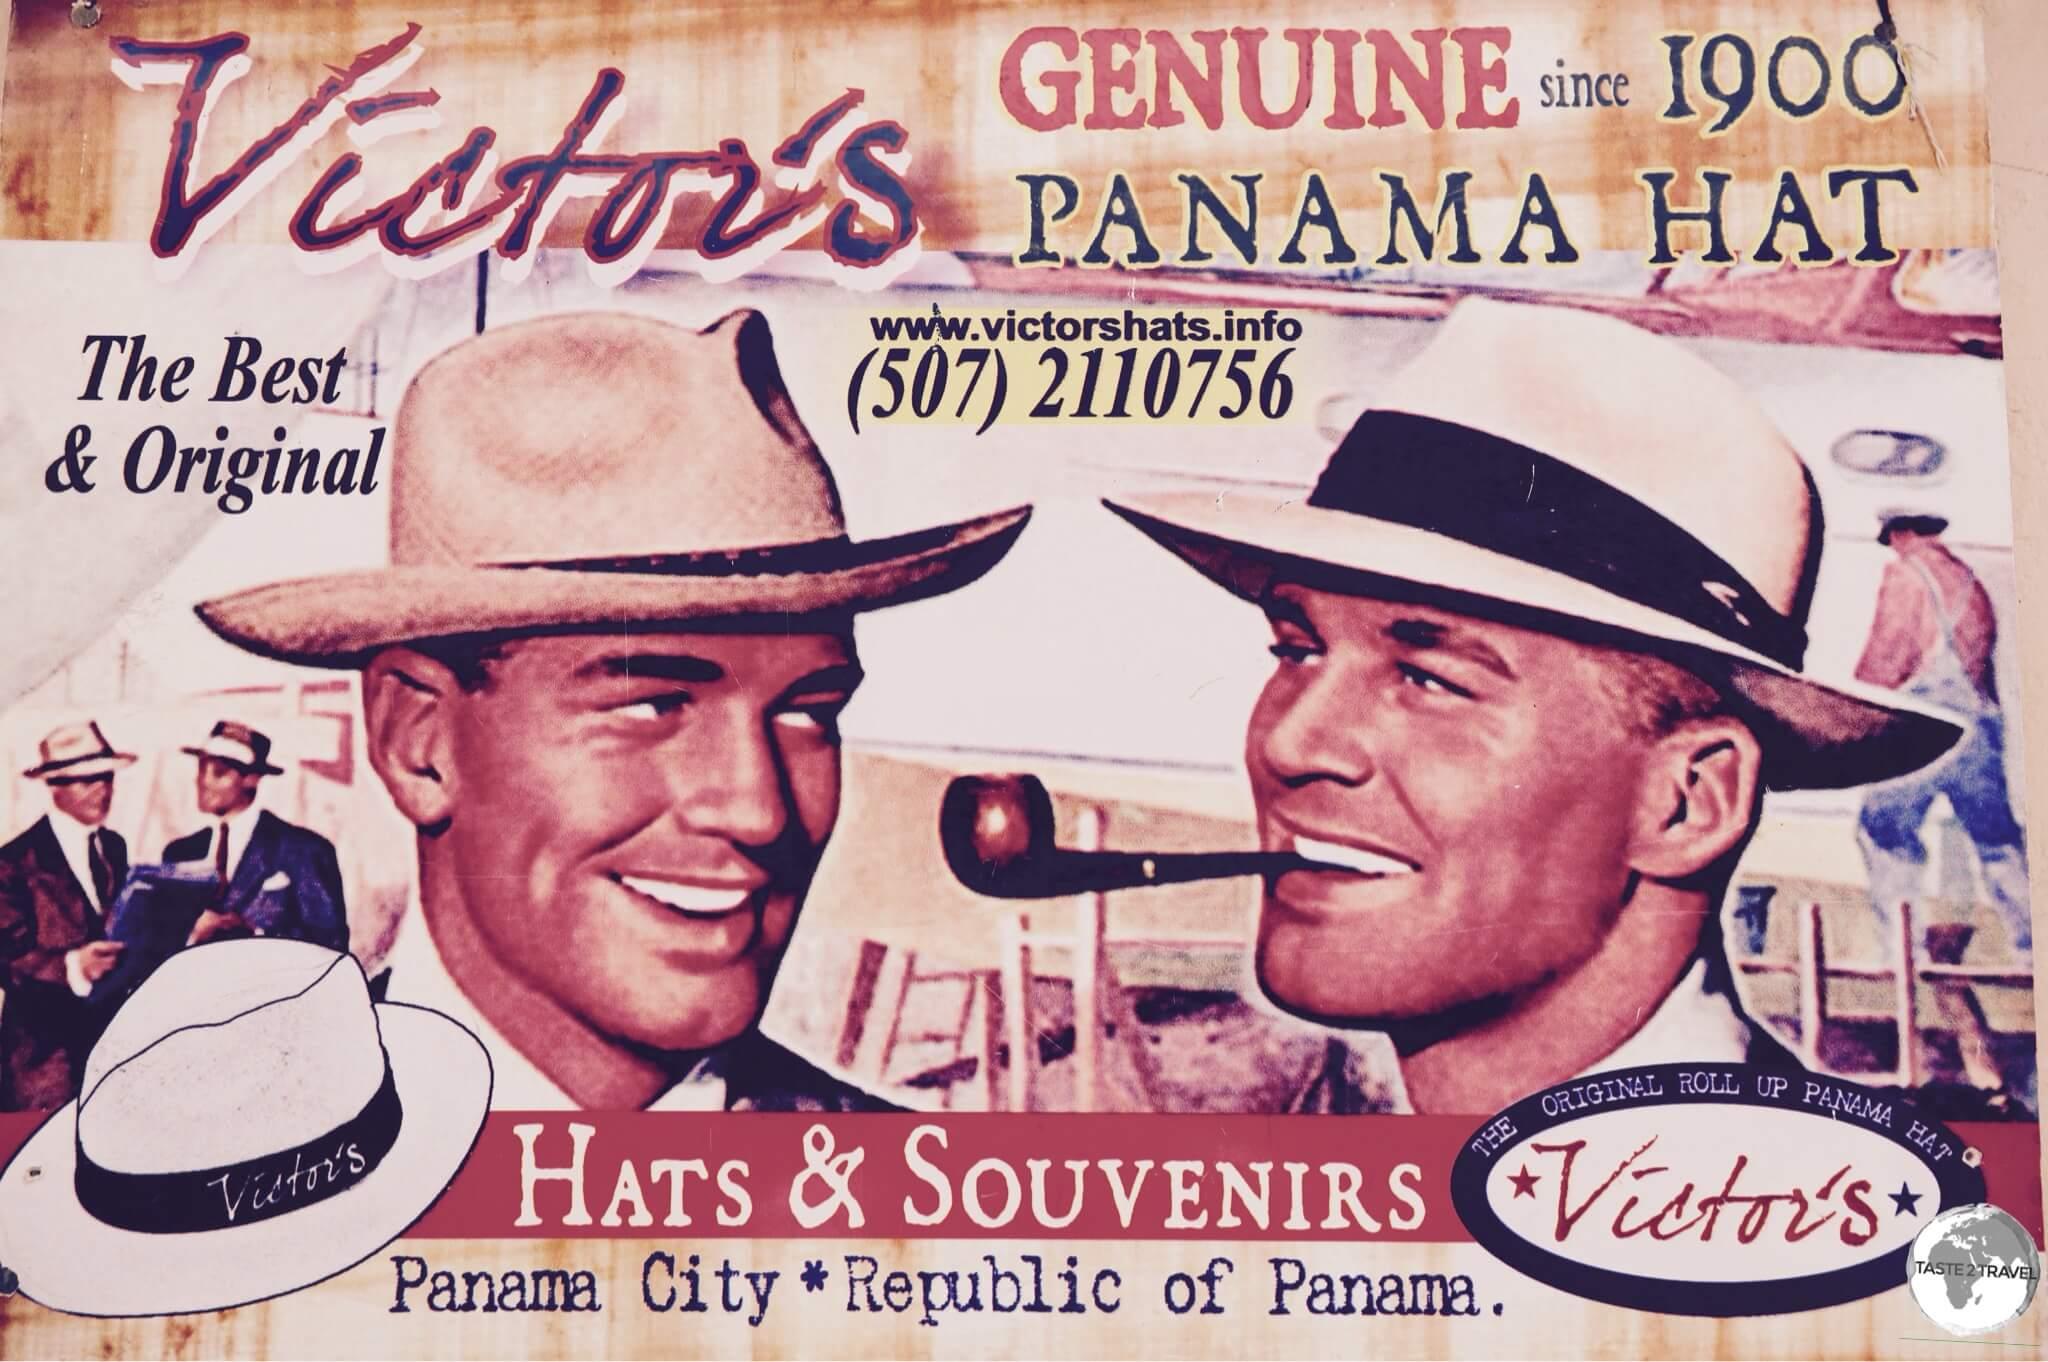 Panama Hat advertisement in Panama old town.